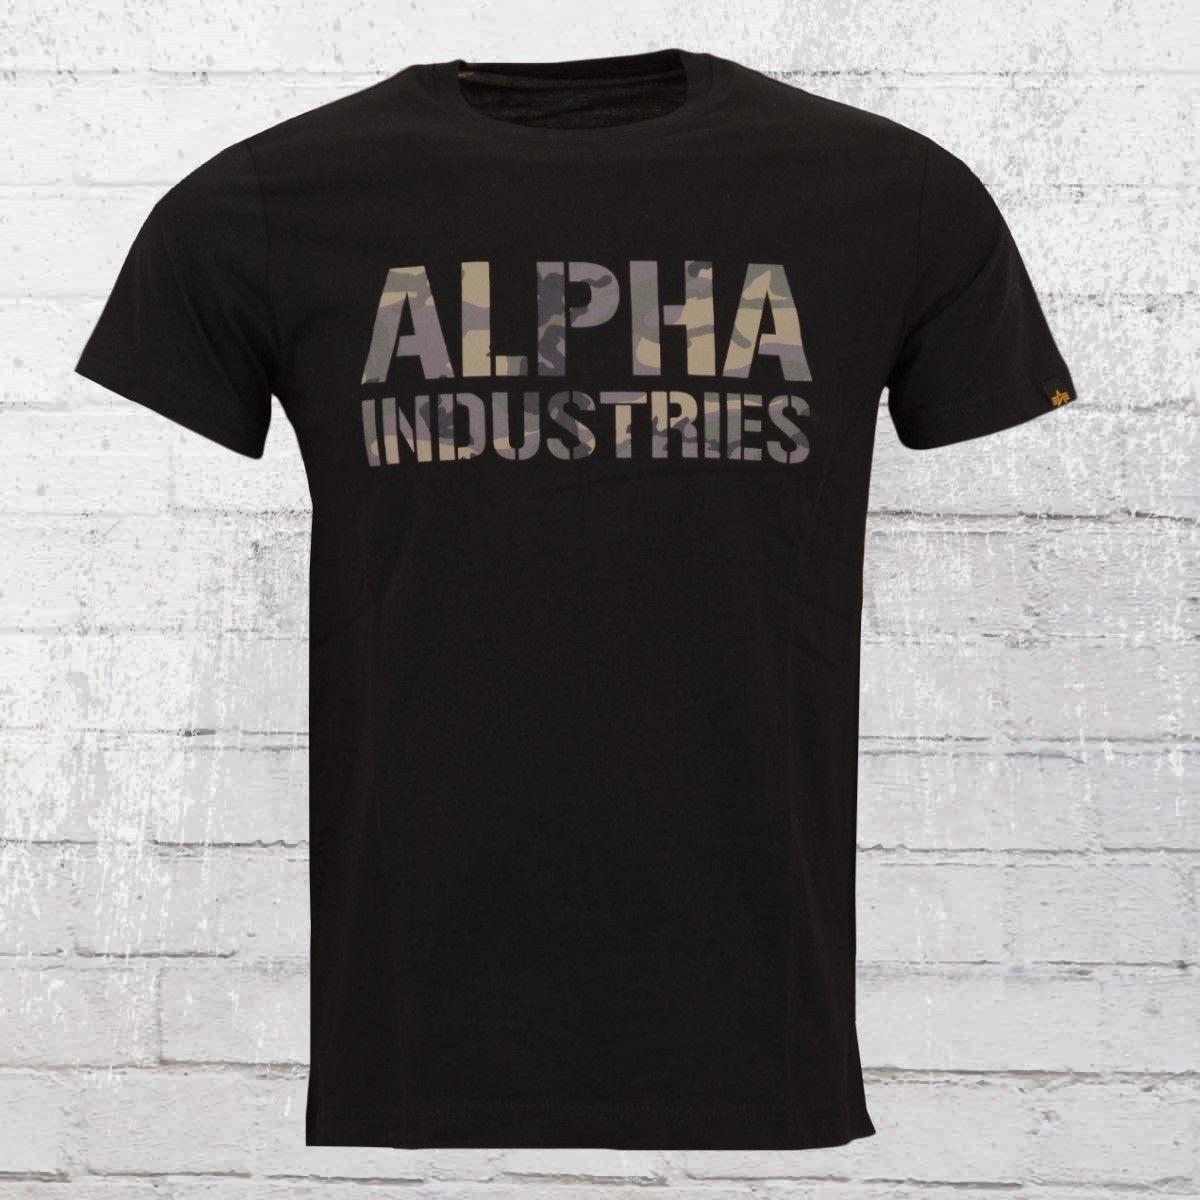 Alpha Industries Camo Druck Weise T Hemd Schwarz Drucken T-Shirt Harajuku Kurzarm Männer Top 100% Baumwolle